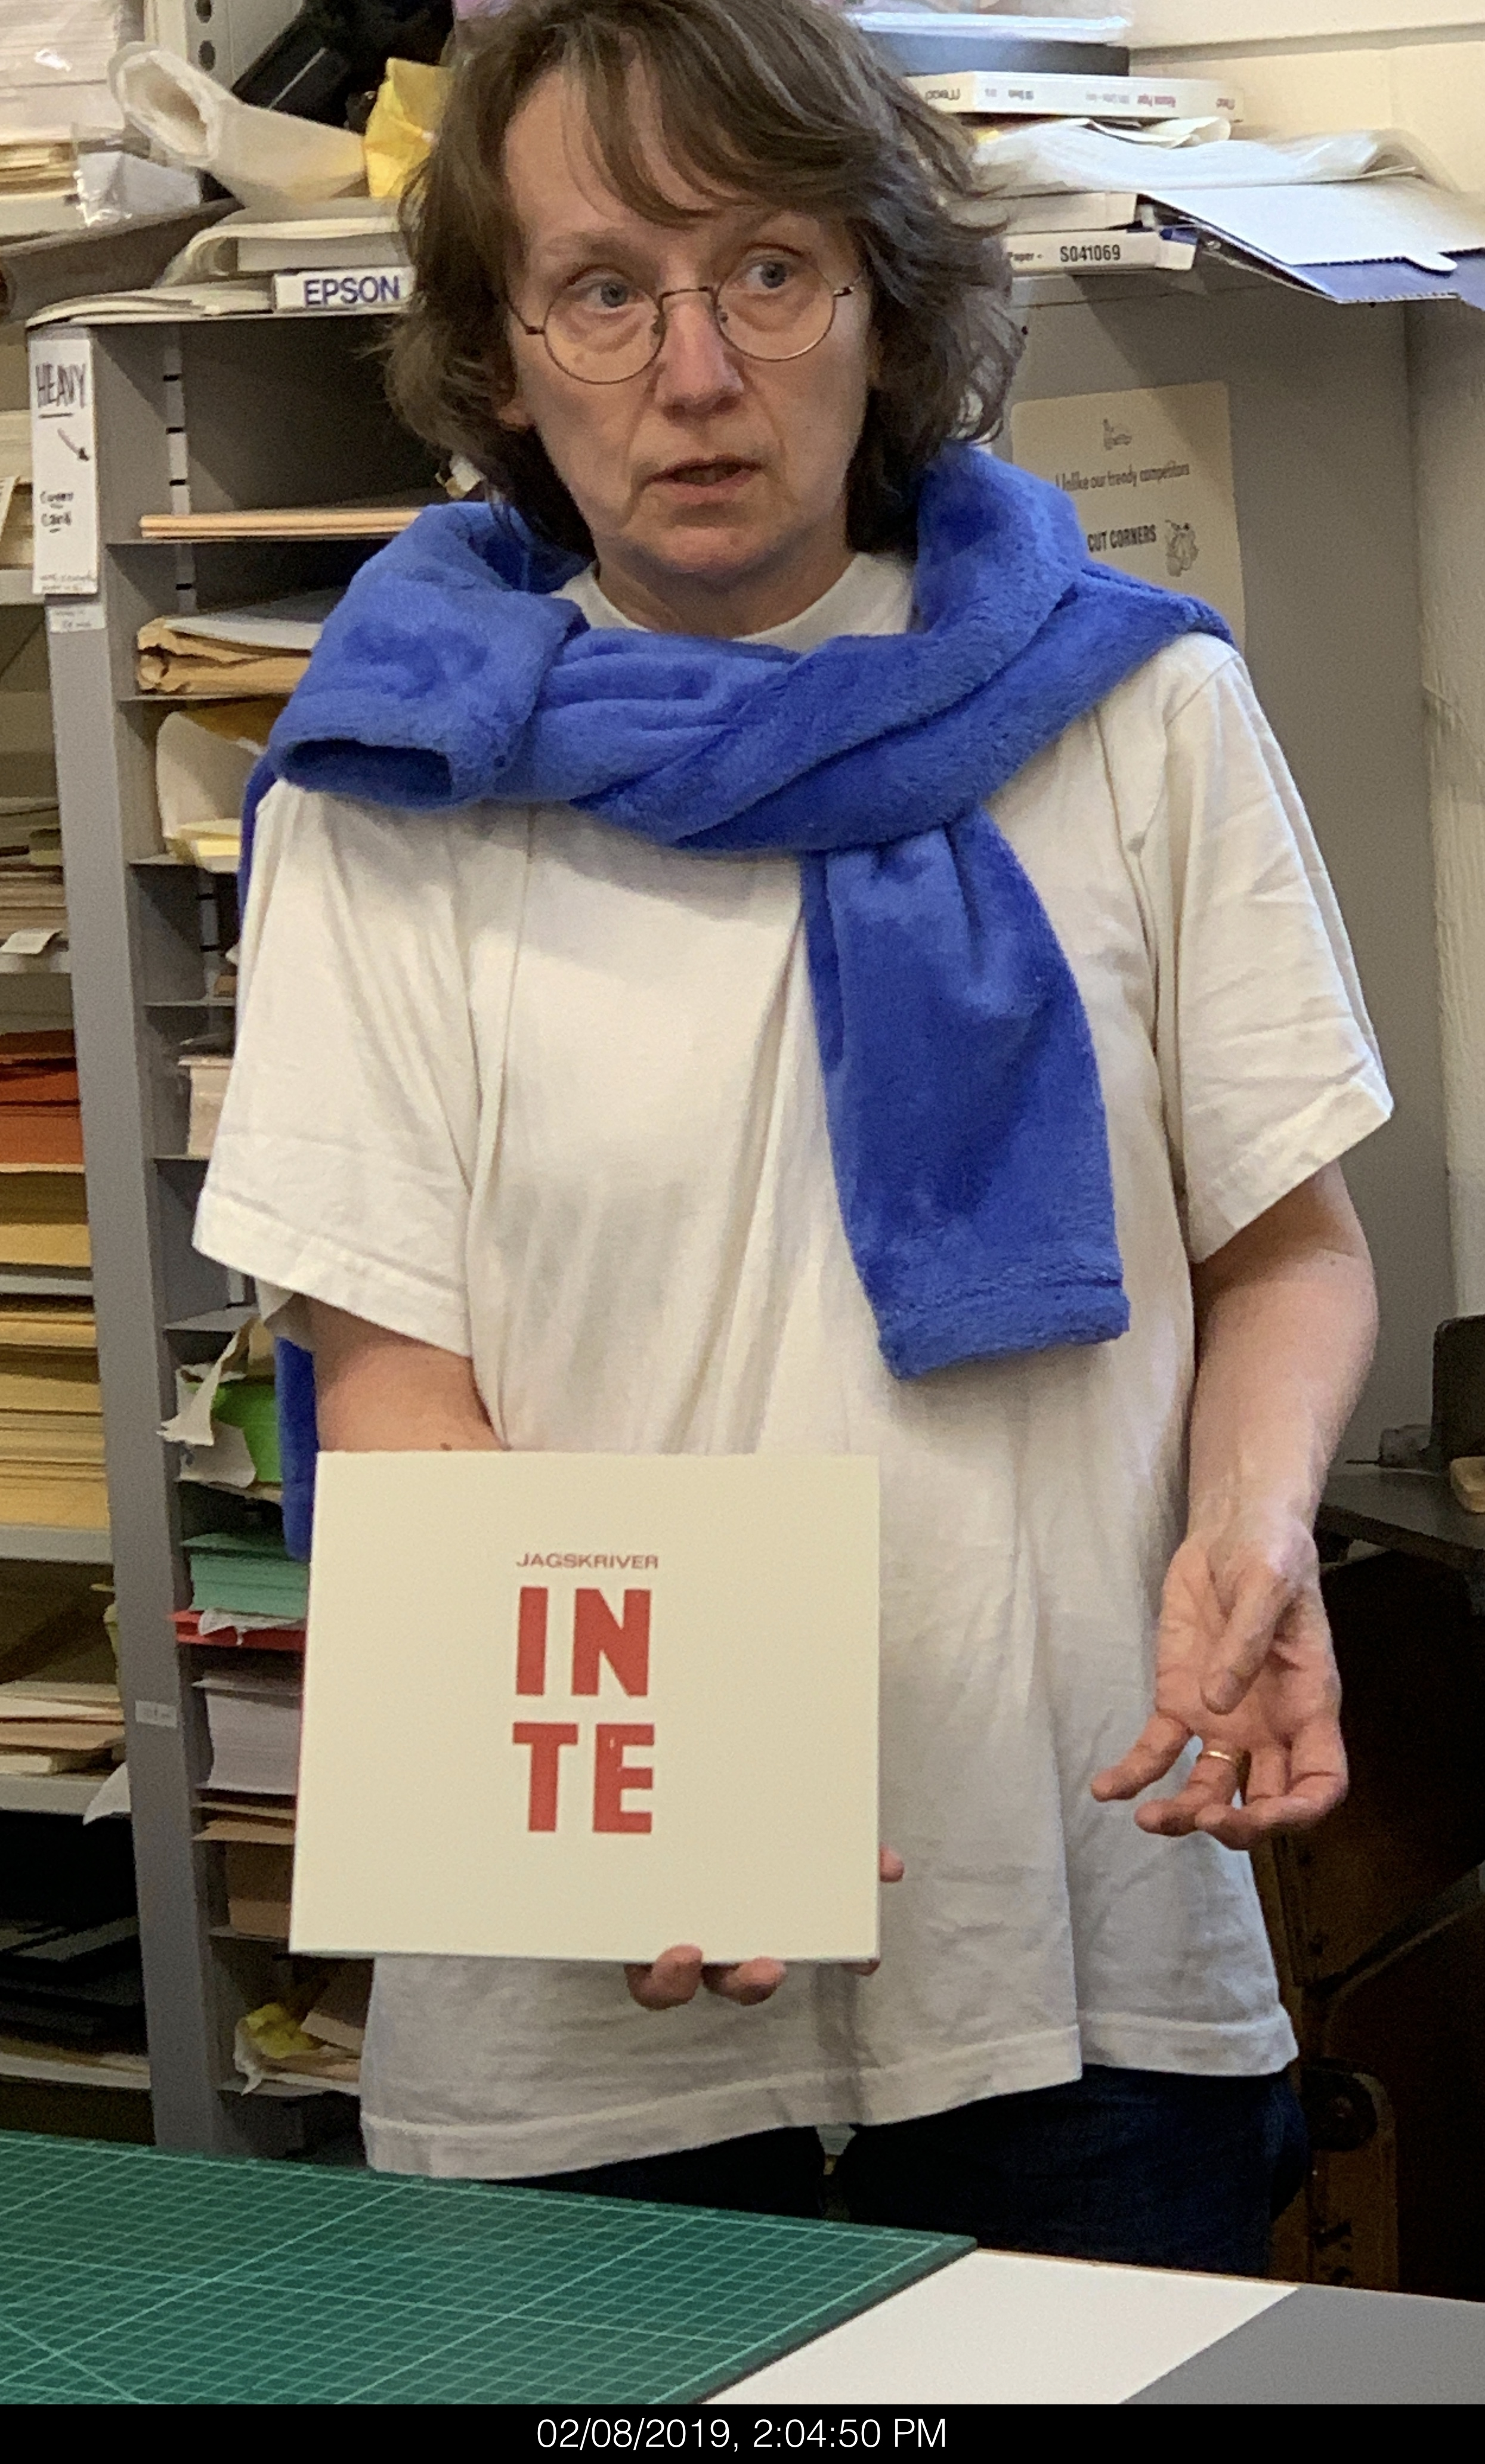 Lina Nordenstrom (Sweden) with artist book